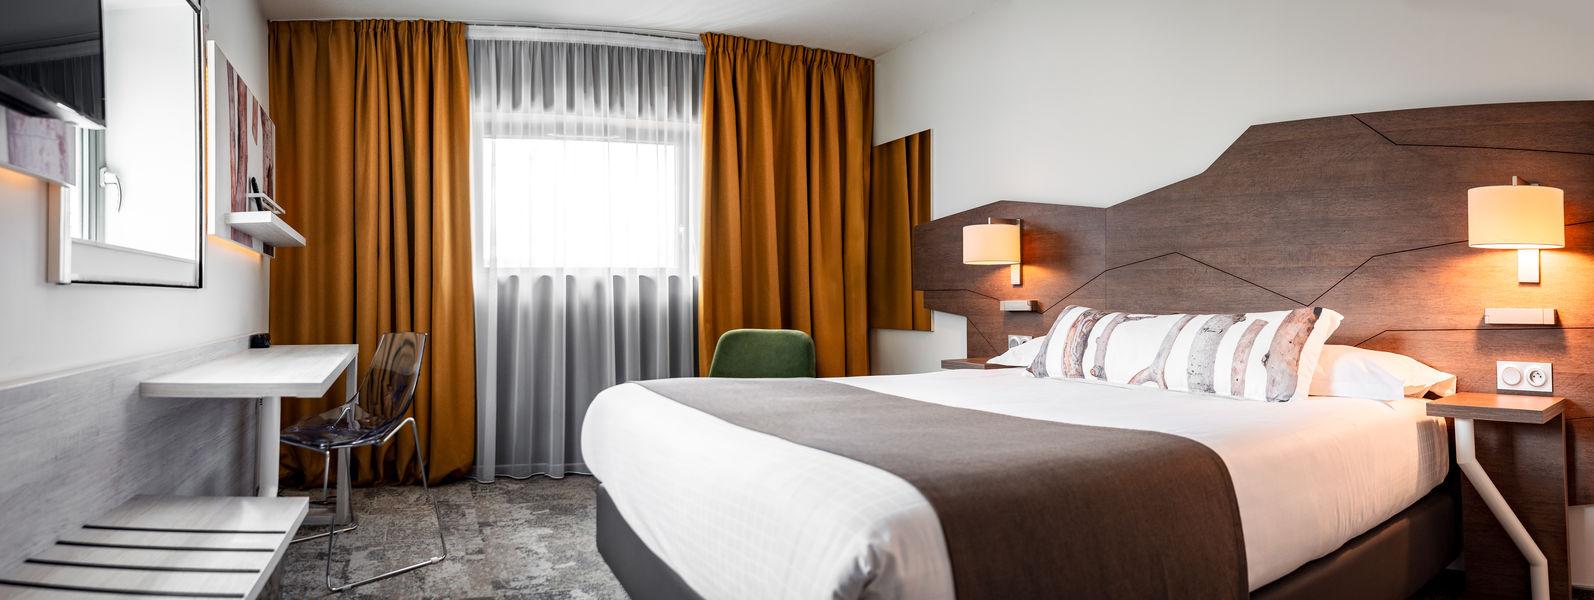 Quality Hôtel Belfort**** Chambre standard